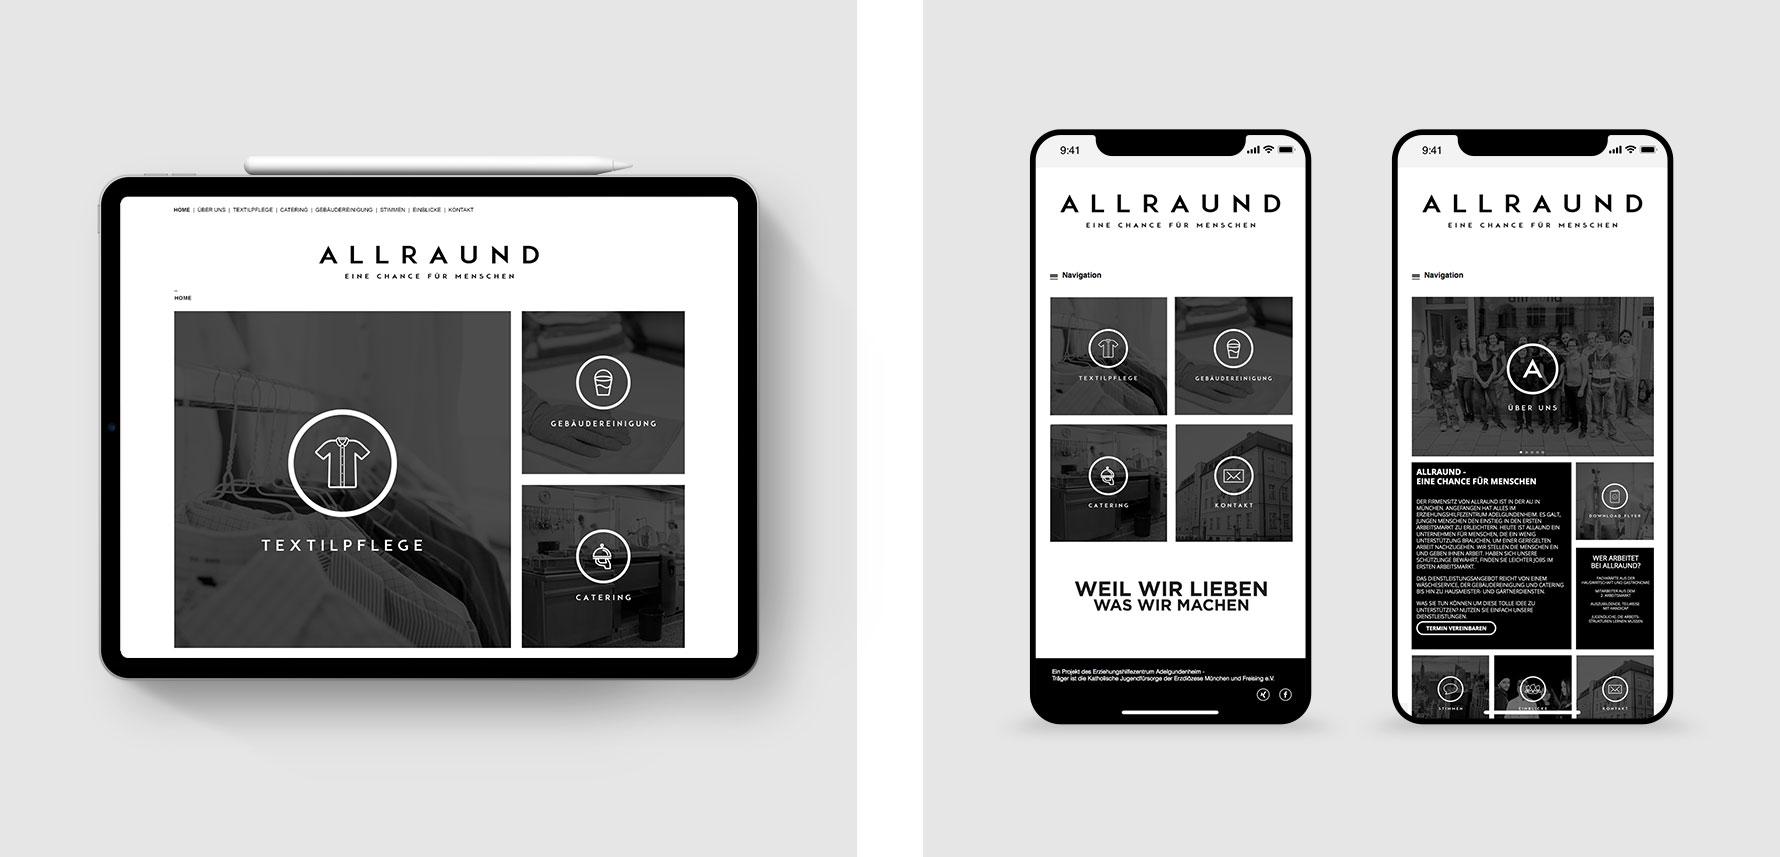 Hüfner Design | Referenz AllrAUnd gGmbH | Corporate Identity | Design Mobile Devices